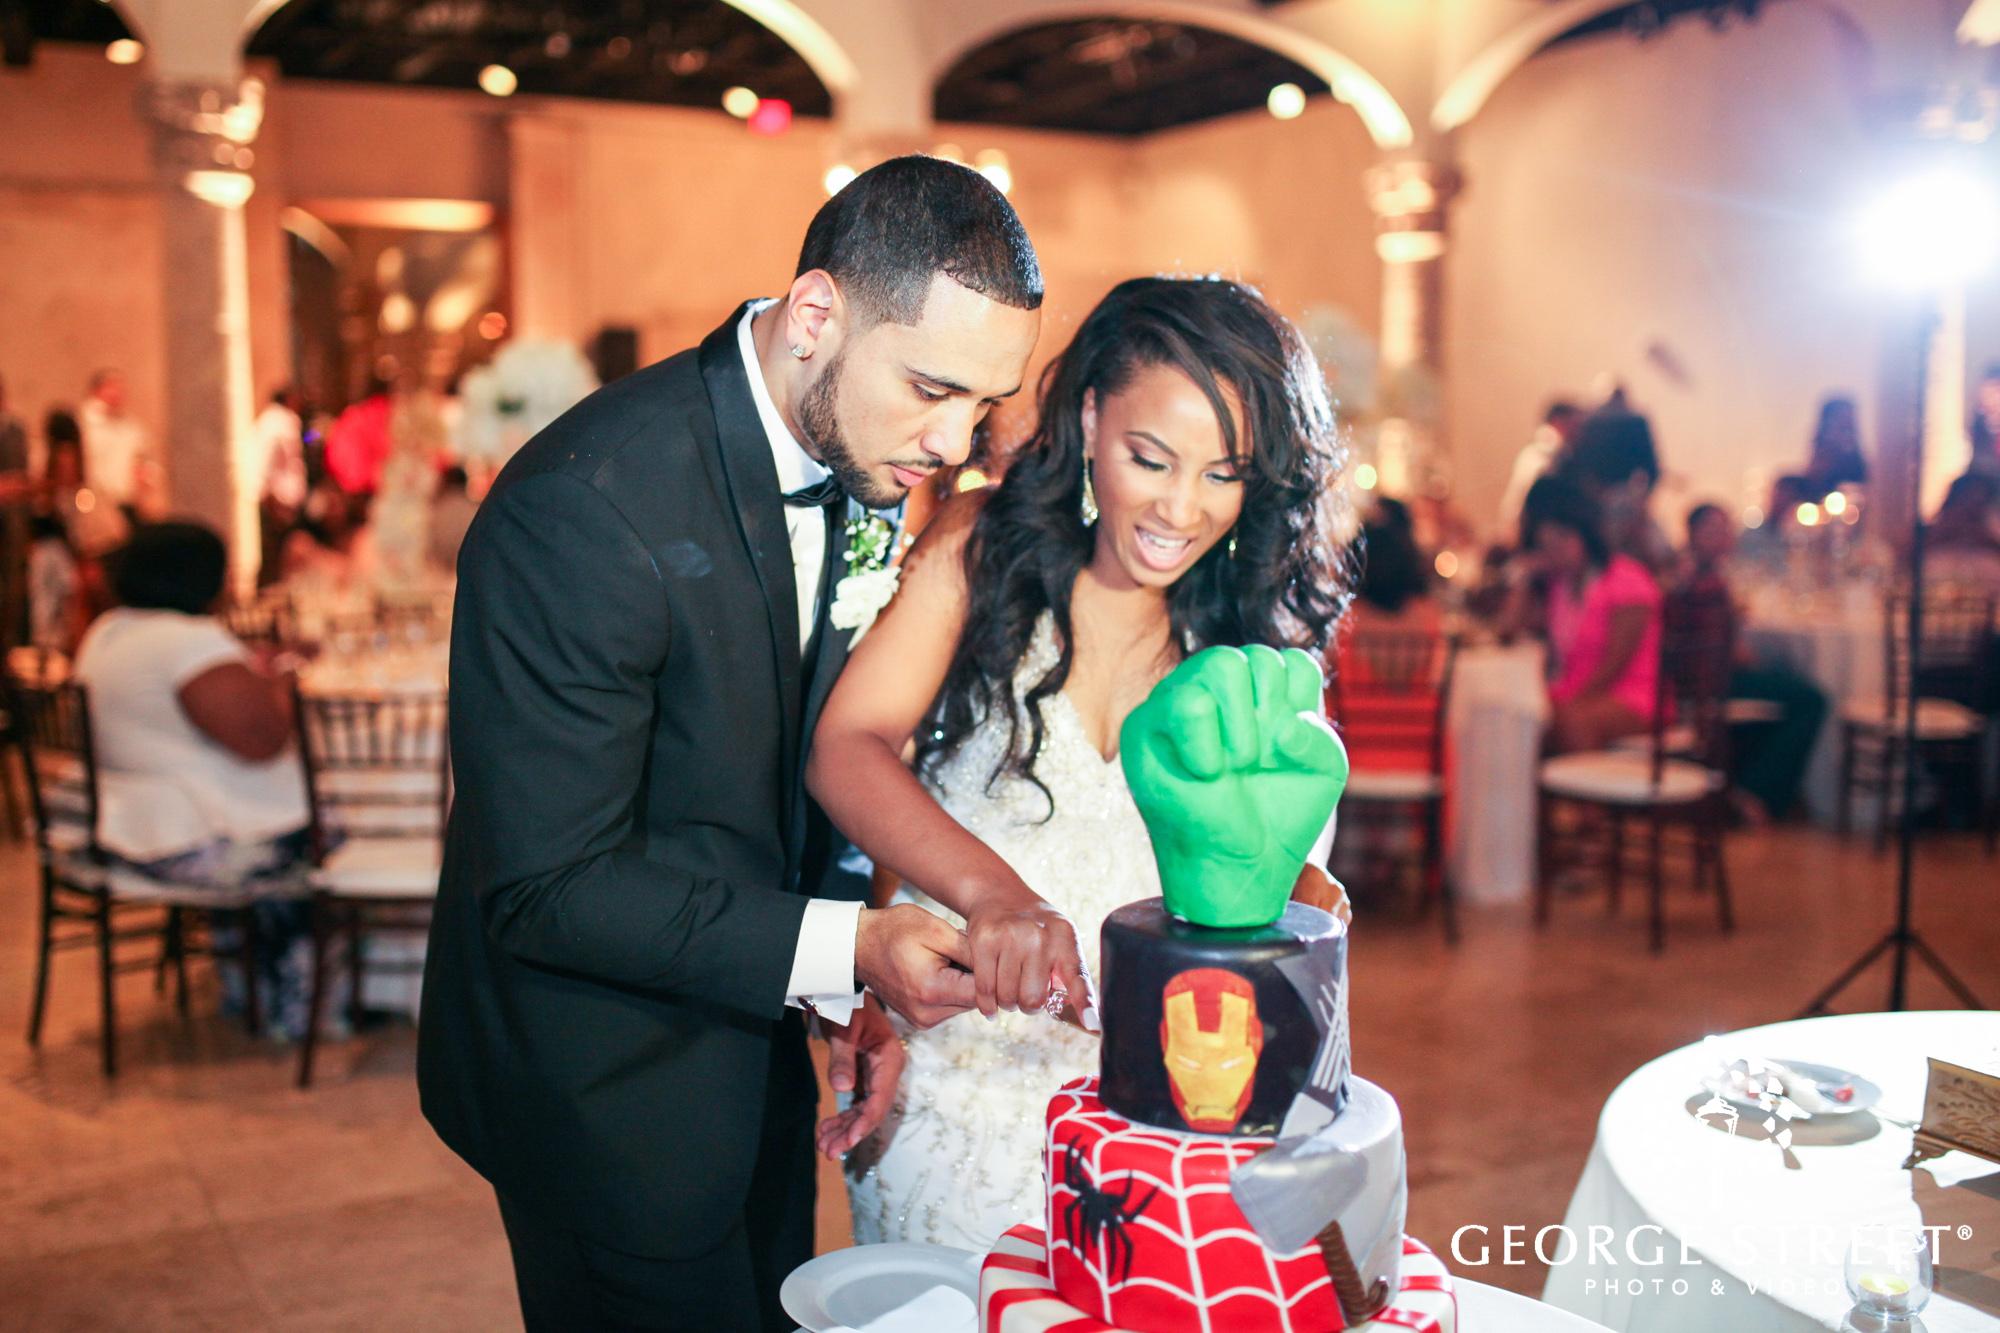 bride and groom cutting wedding cake 2